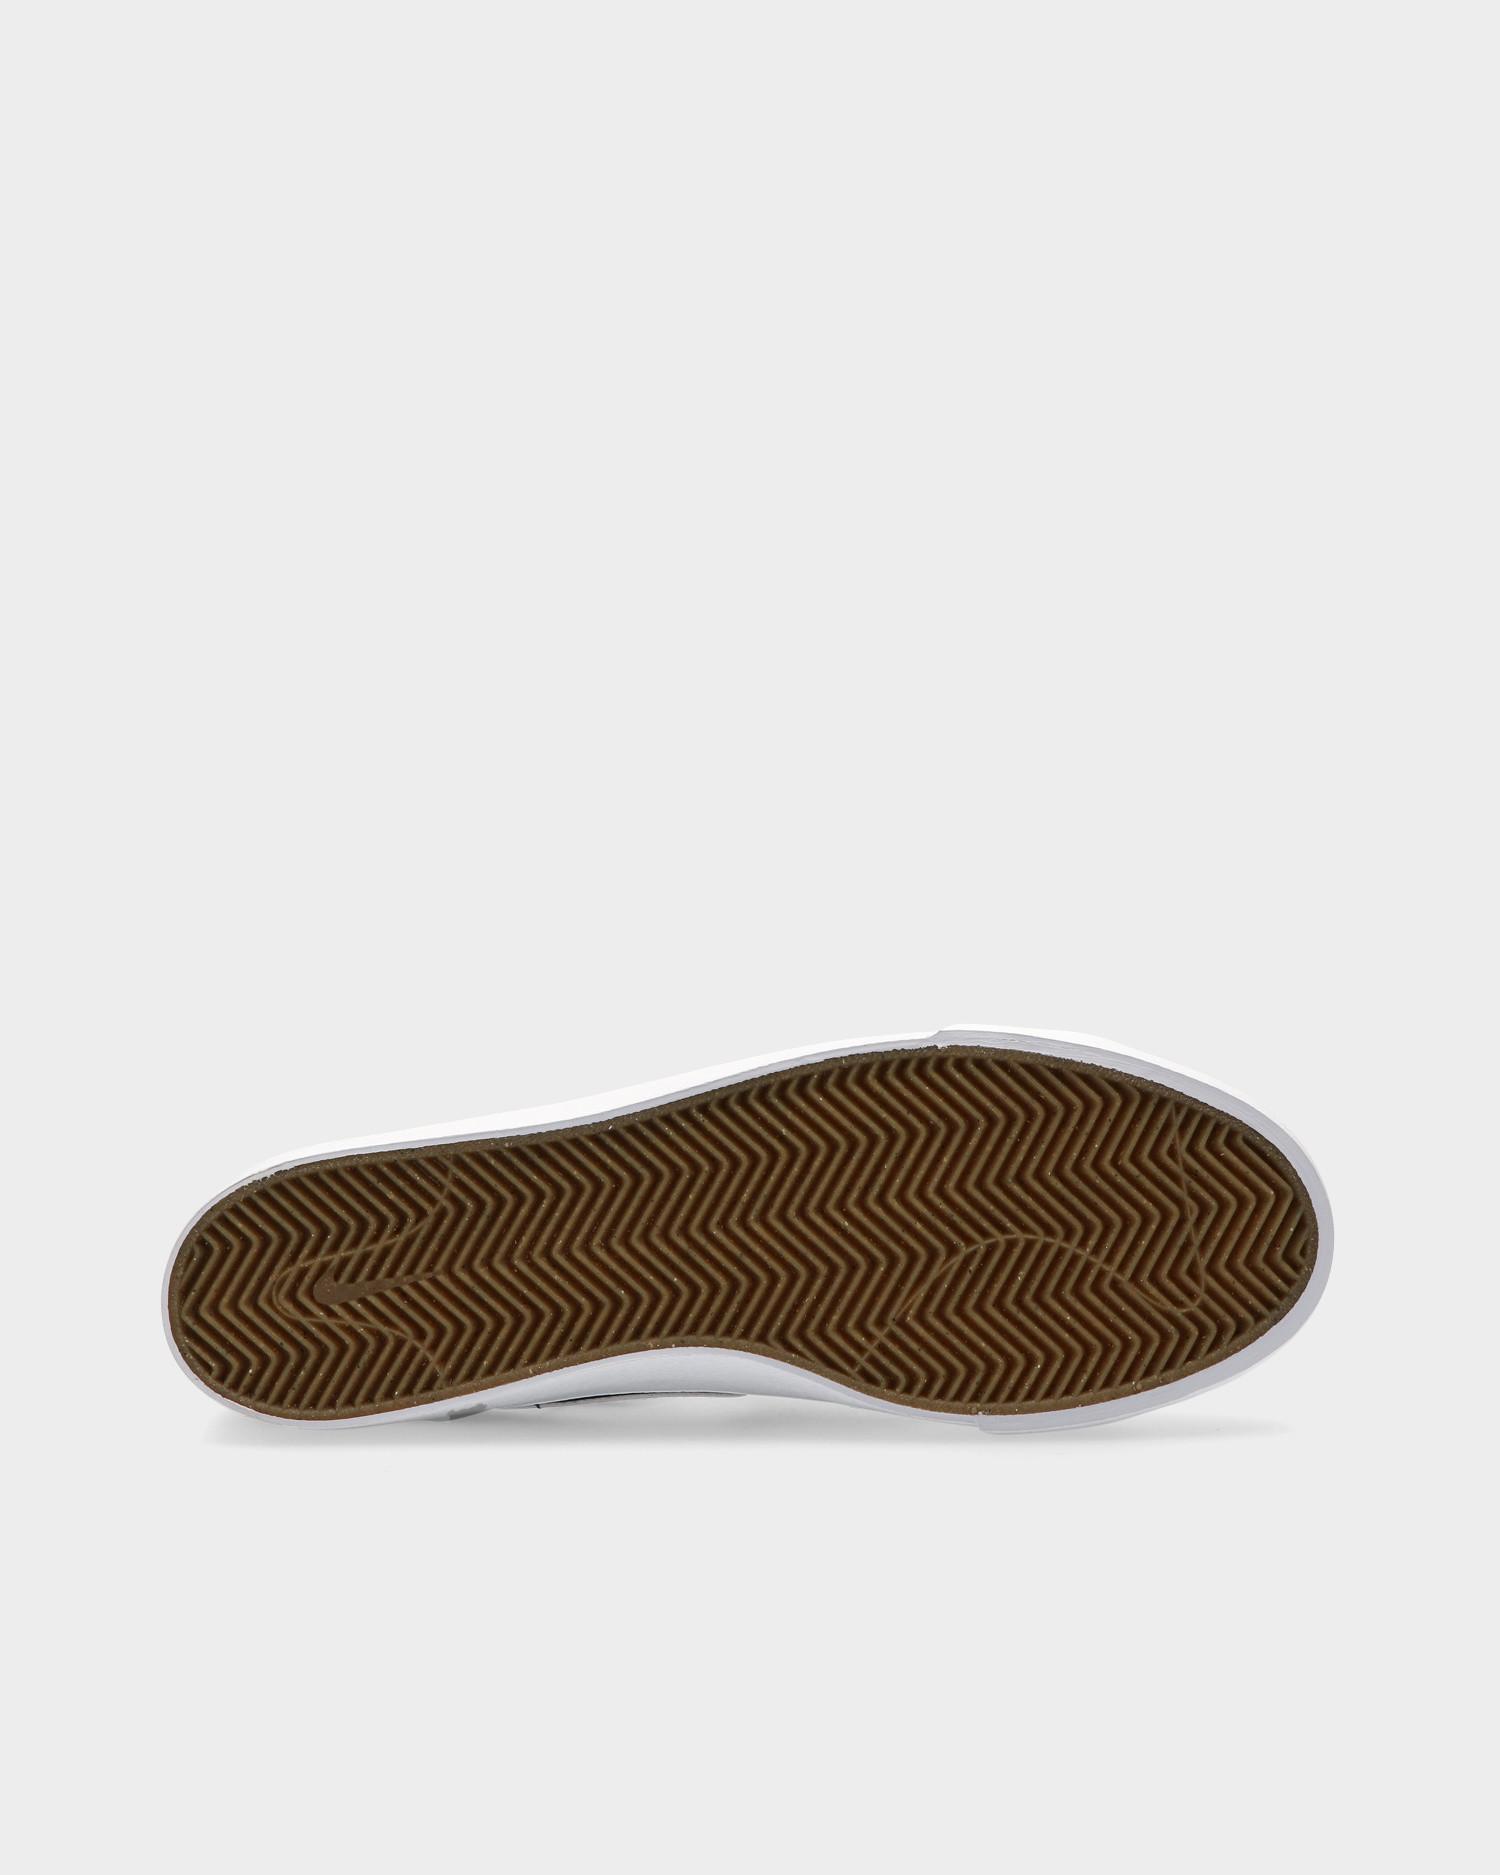 Nike SB Blazer Court Black/White-Black Gum Light Brown